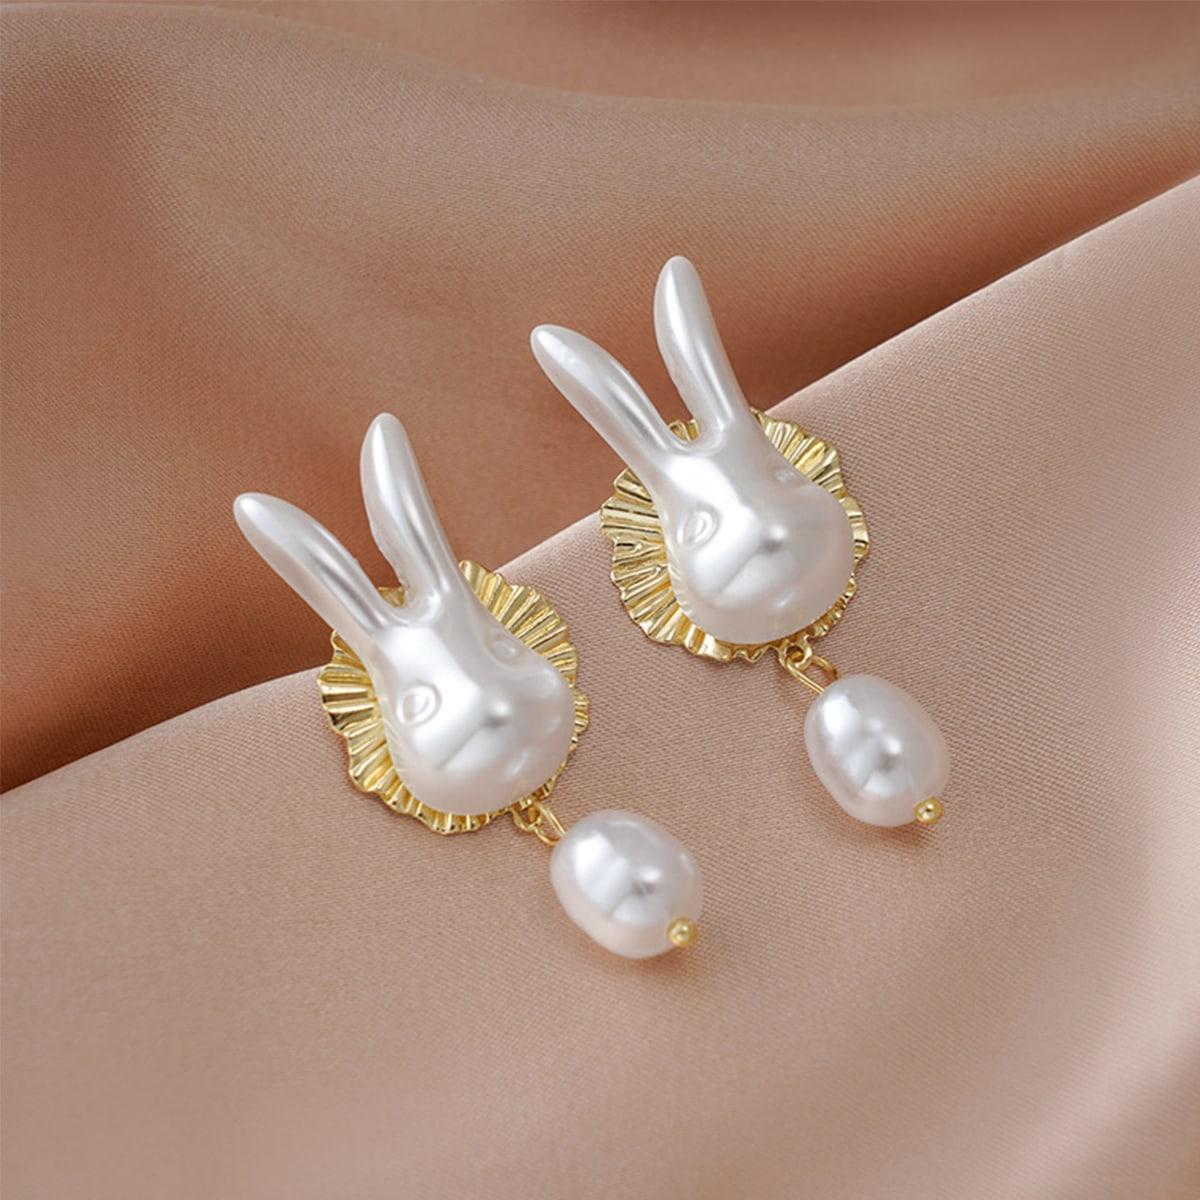 Faux Pearl Rabbit Drop Earrings, SHEIN  - buy with discount